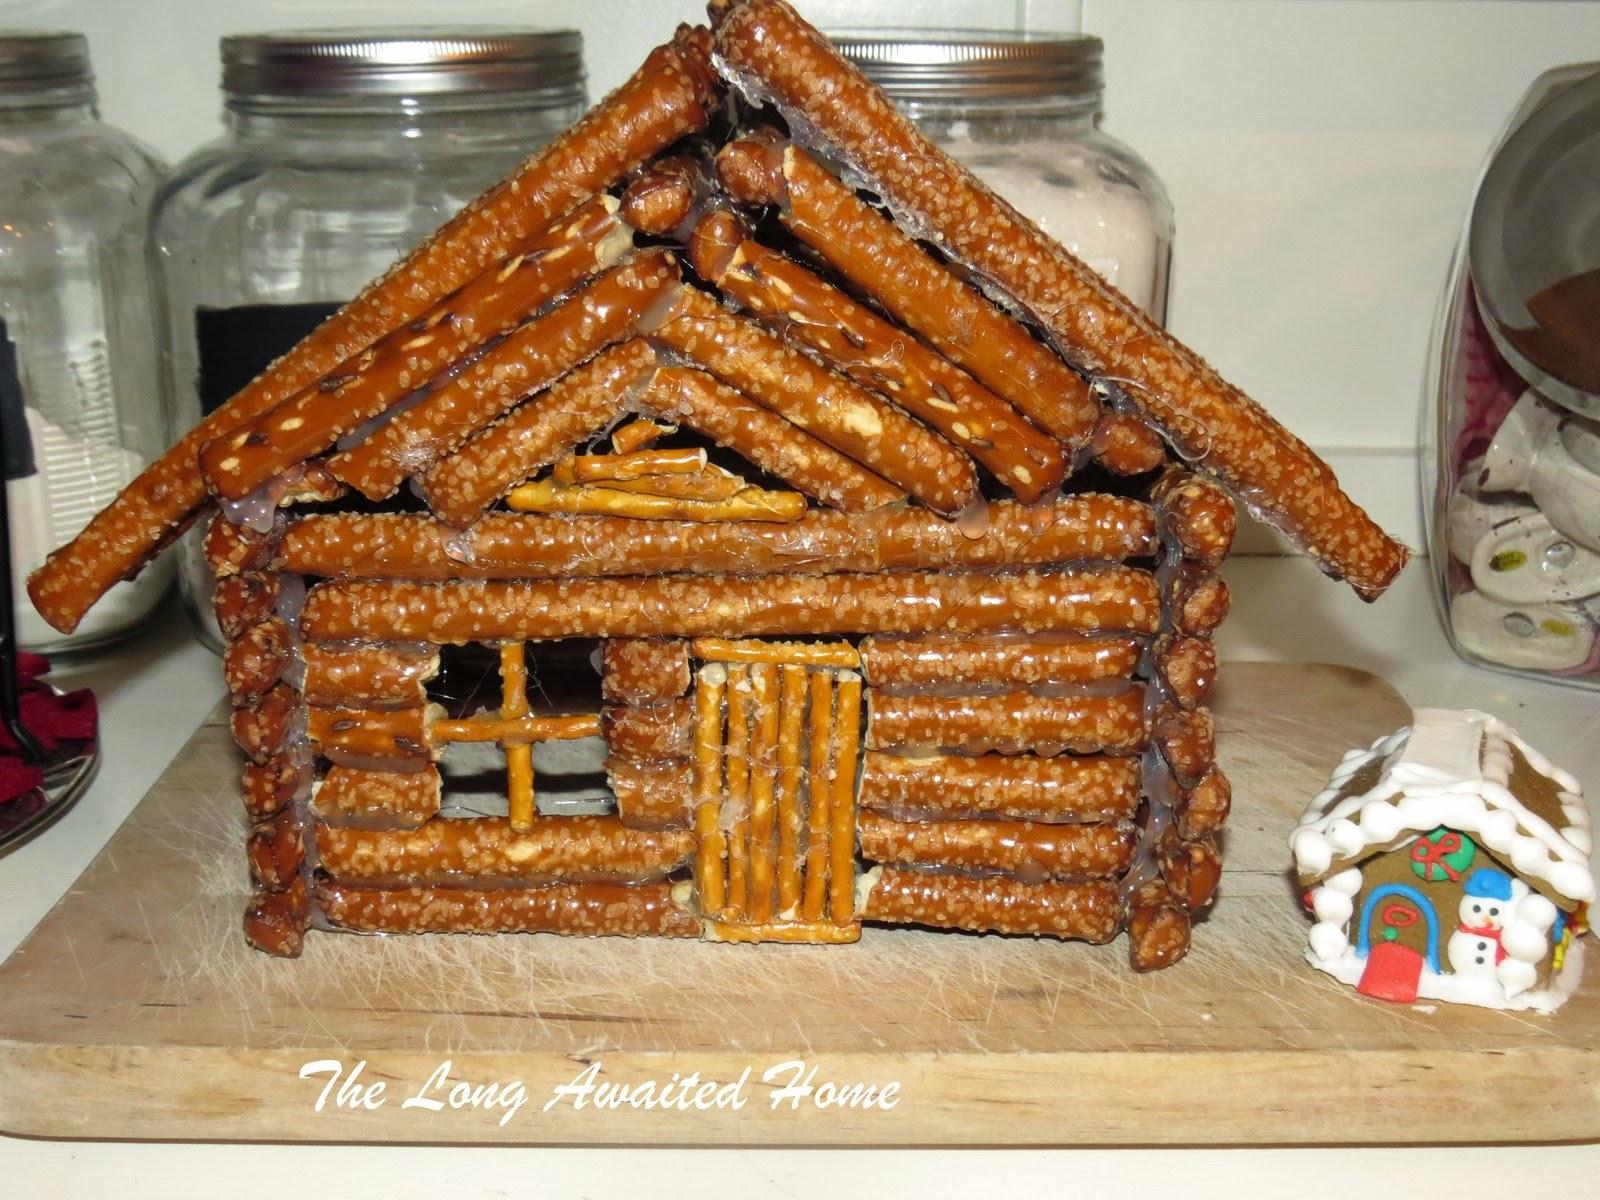 The Long Awaited Home Gingerbread House Aka Pretzel Log Cabin